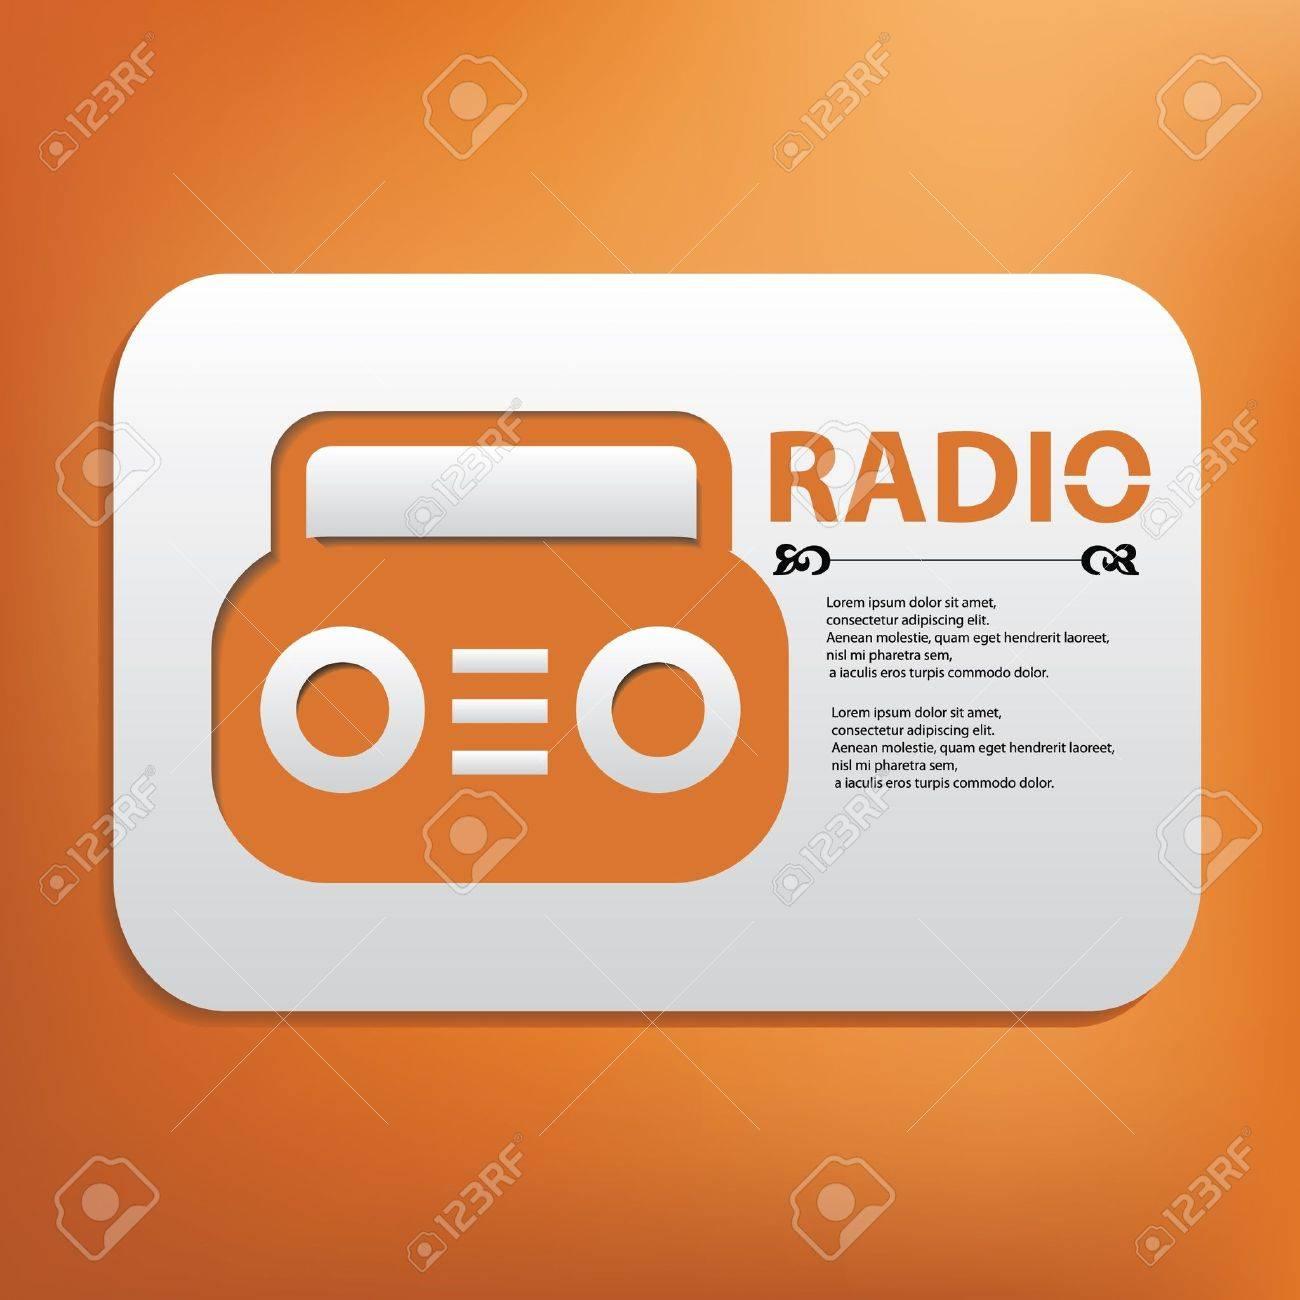 Radio symbol Stock Vector - 20565097